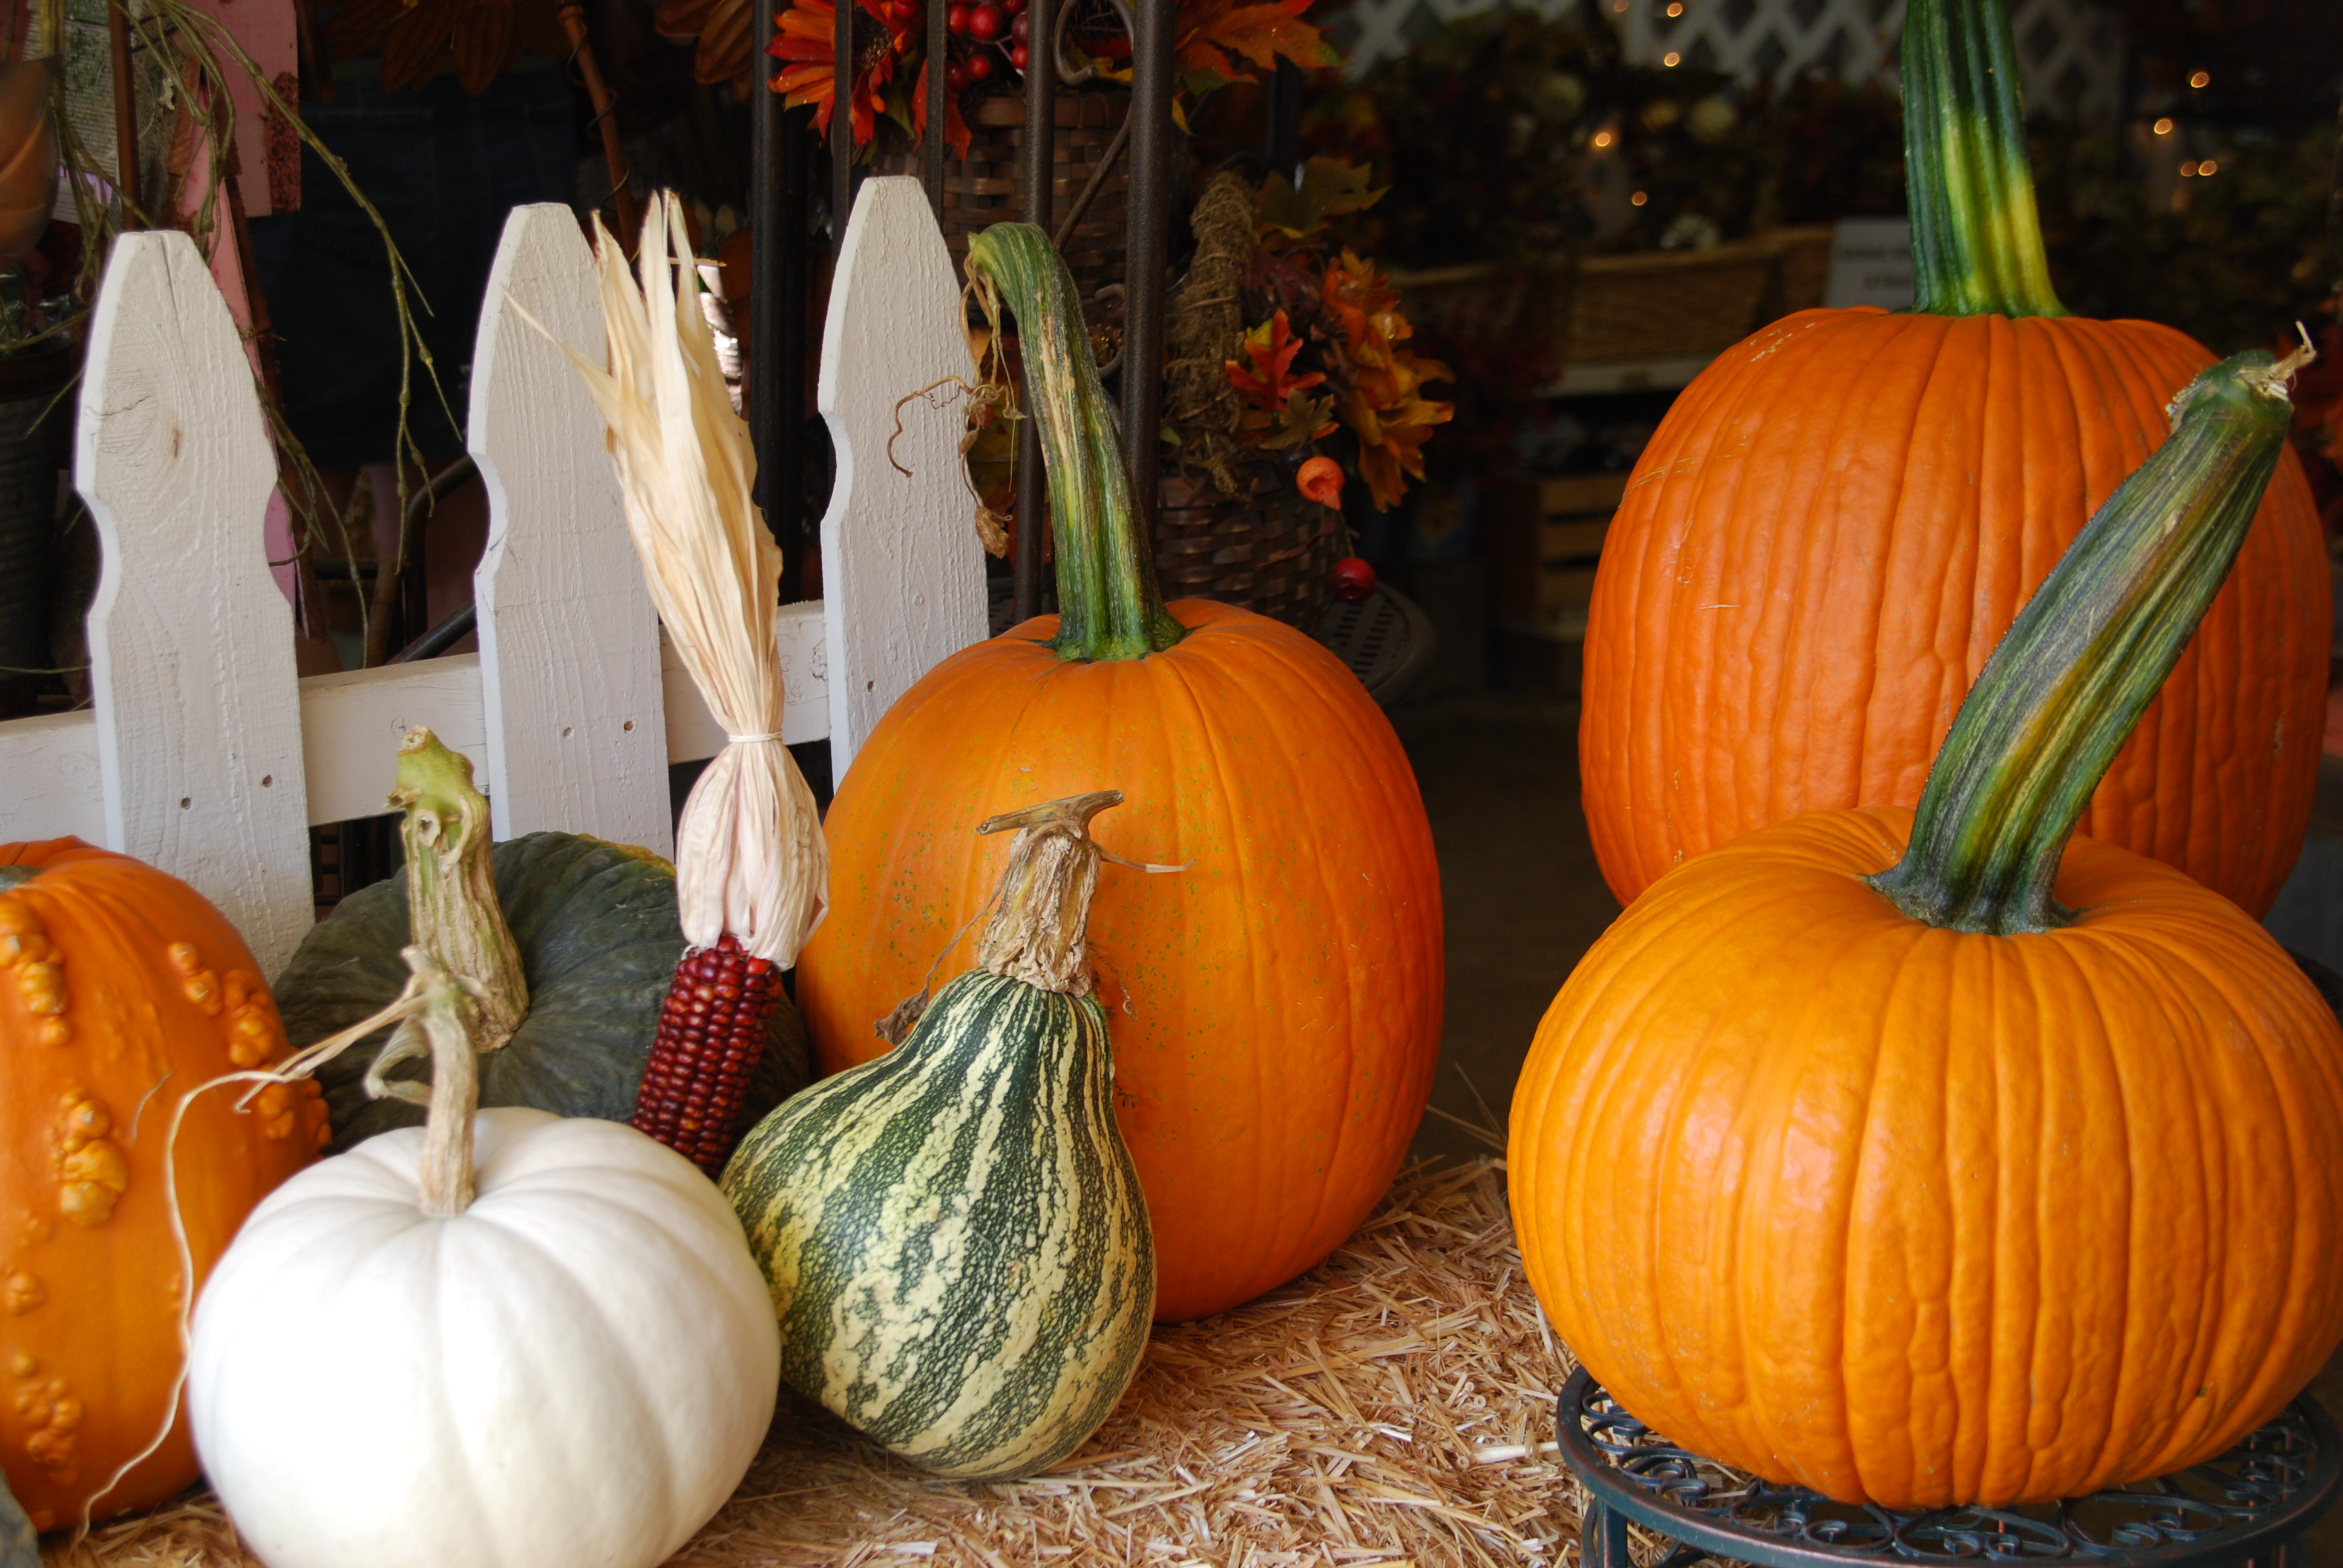 Facts About Pumpkins